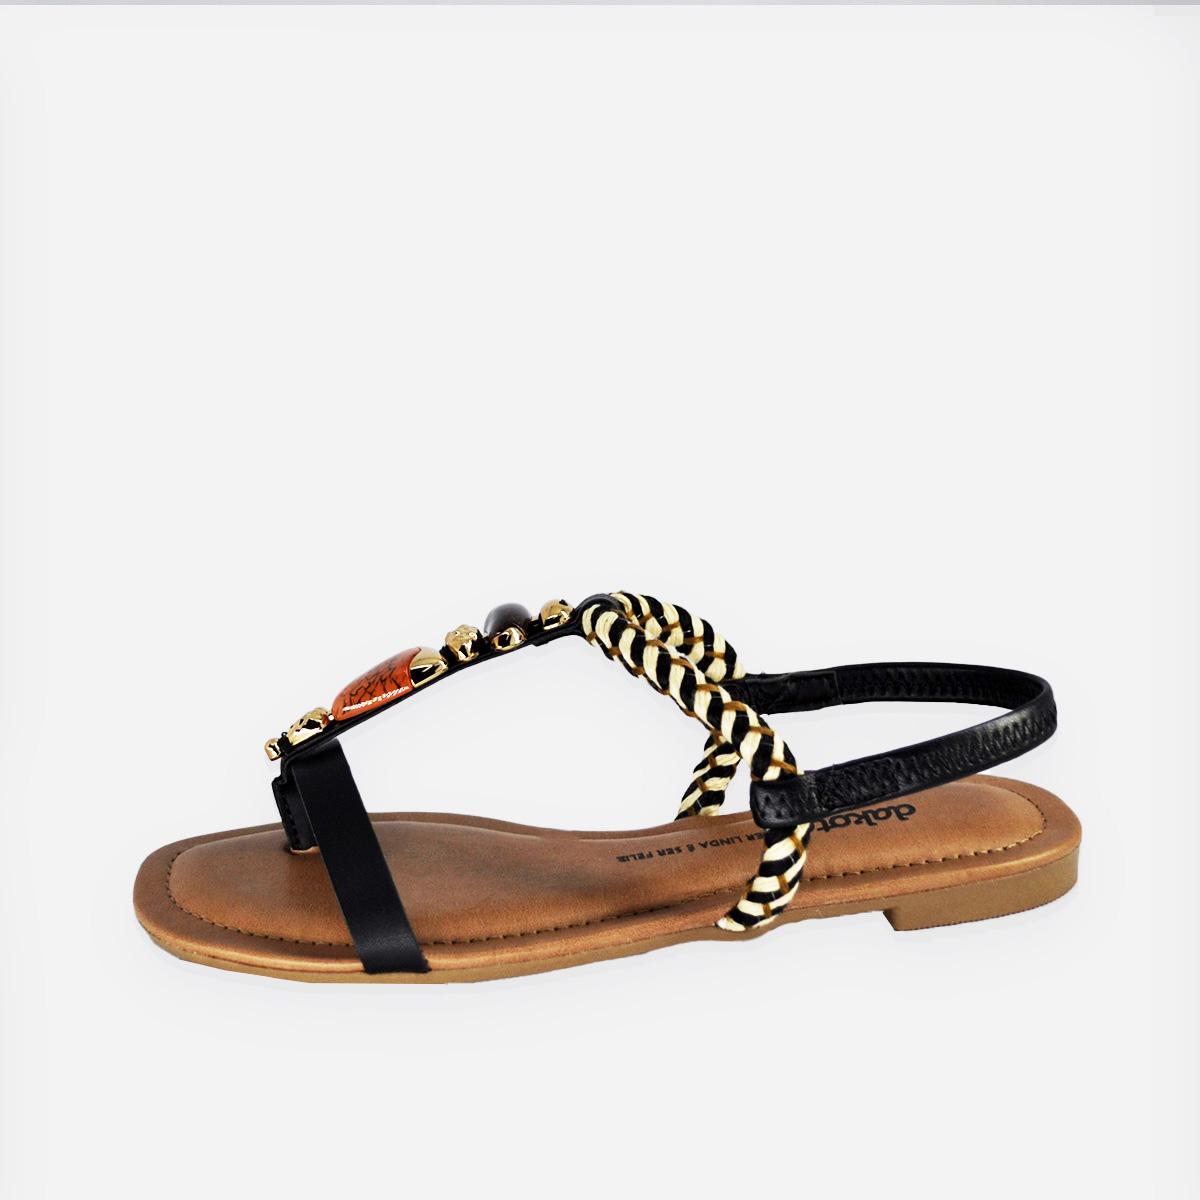 Sandália  Dakota Rasteira  Manila Tira Preto/Marfim